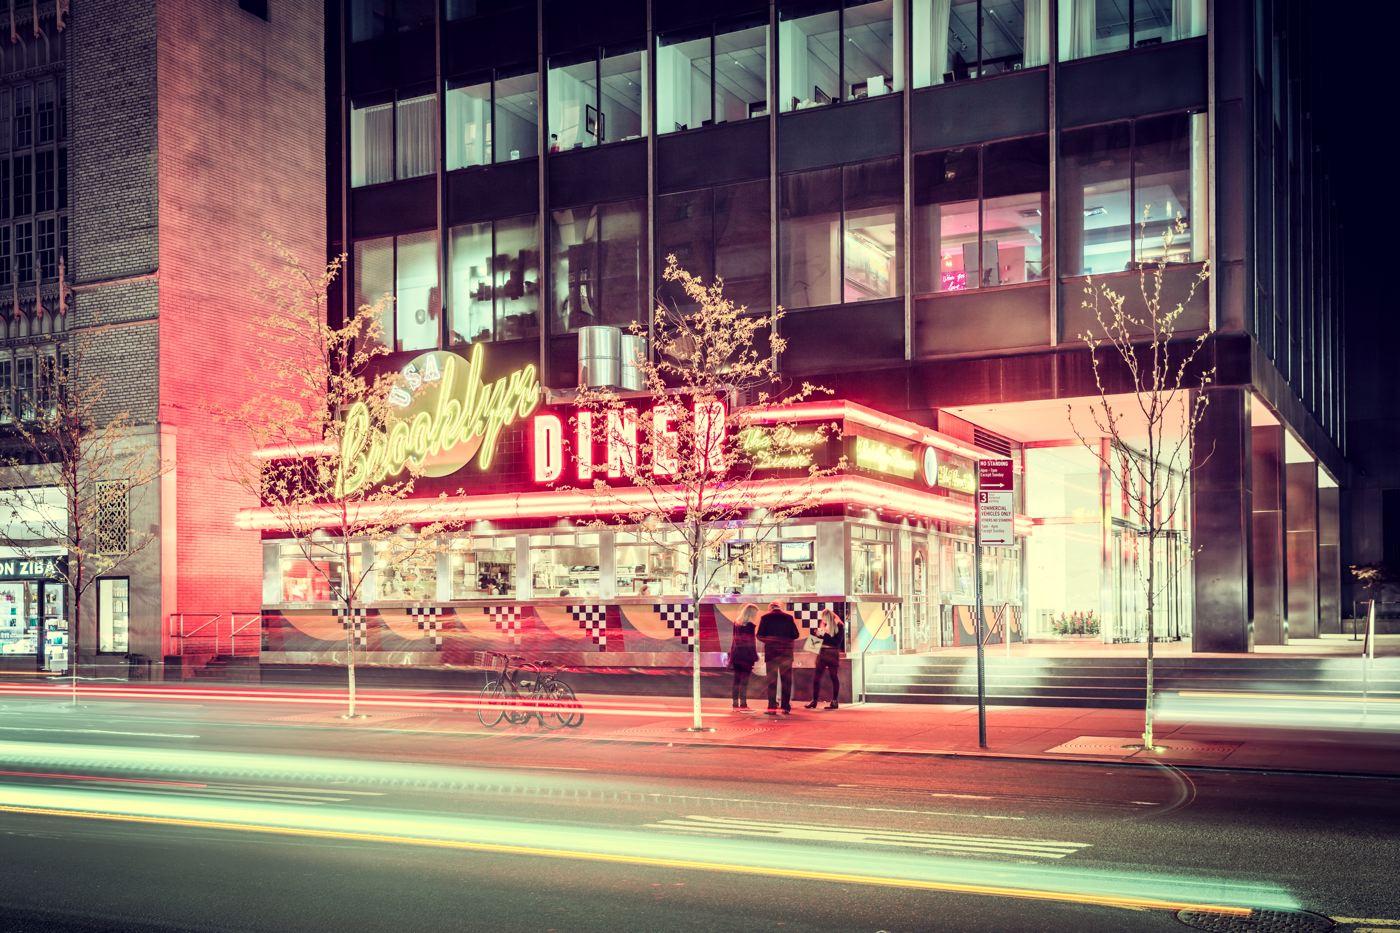 LDKphoto-NYC - Brooklyn Diner-v02.jpg